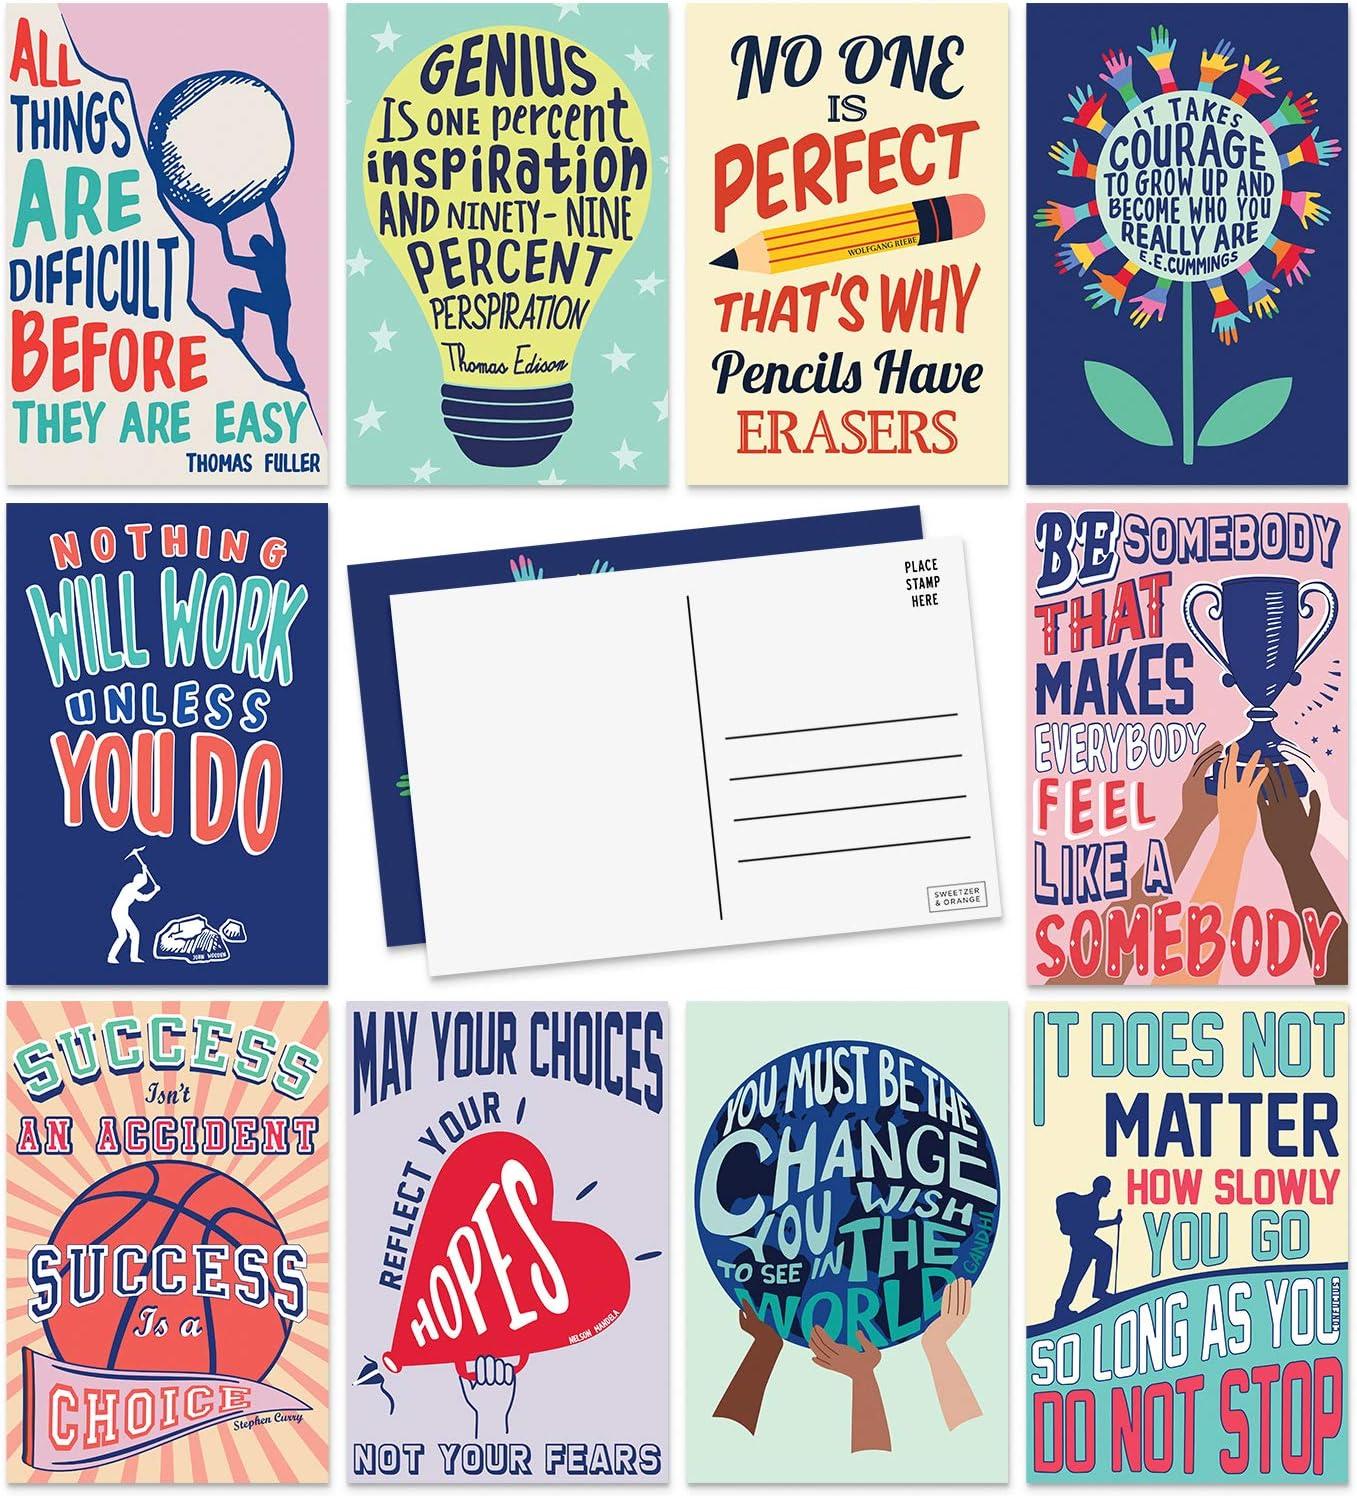 Sweetzer & Orange Motivational Postcards Pack (60 Post Cards) 4x6 Postcards for Kids and Adults. Growth Mindset Affirmation Cards, Mindfulness Cards, Inspiration Cards and Blank Encouragement Cards